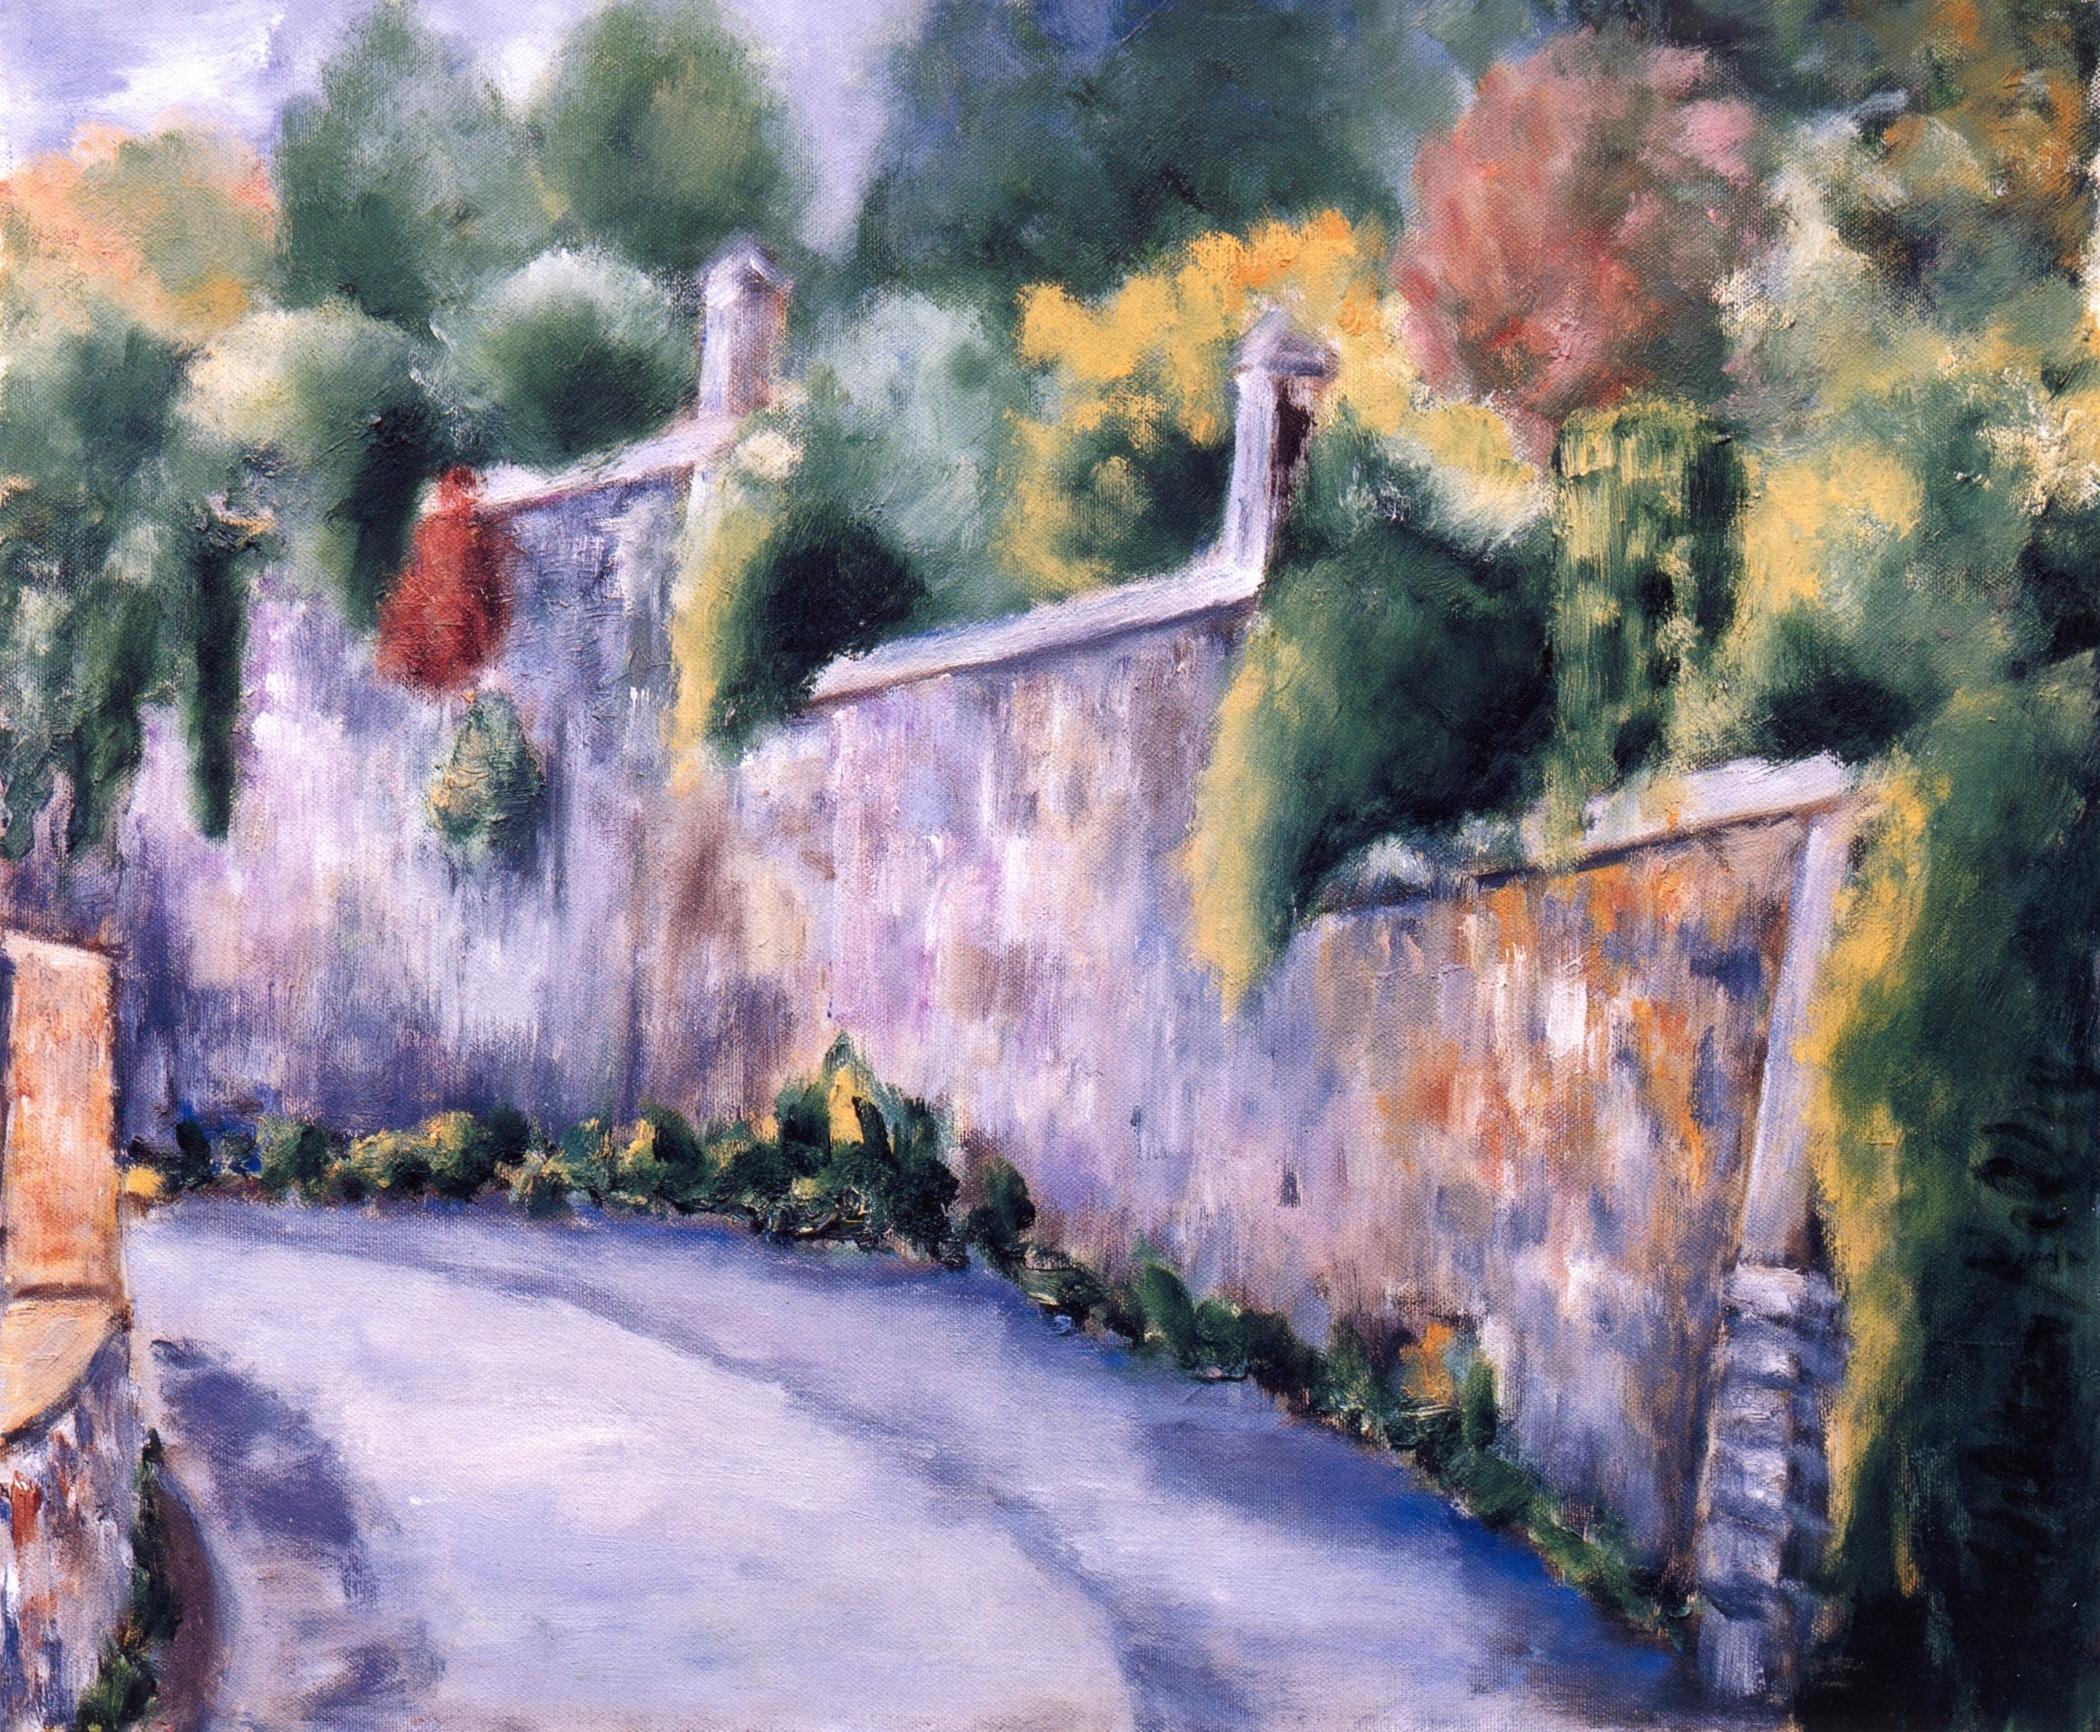 La Strada, Fiesole   Oil on canvas, 20'' x 24'', 2004